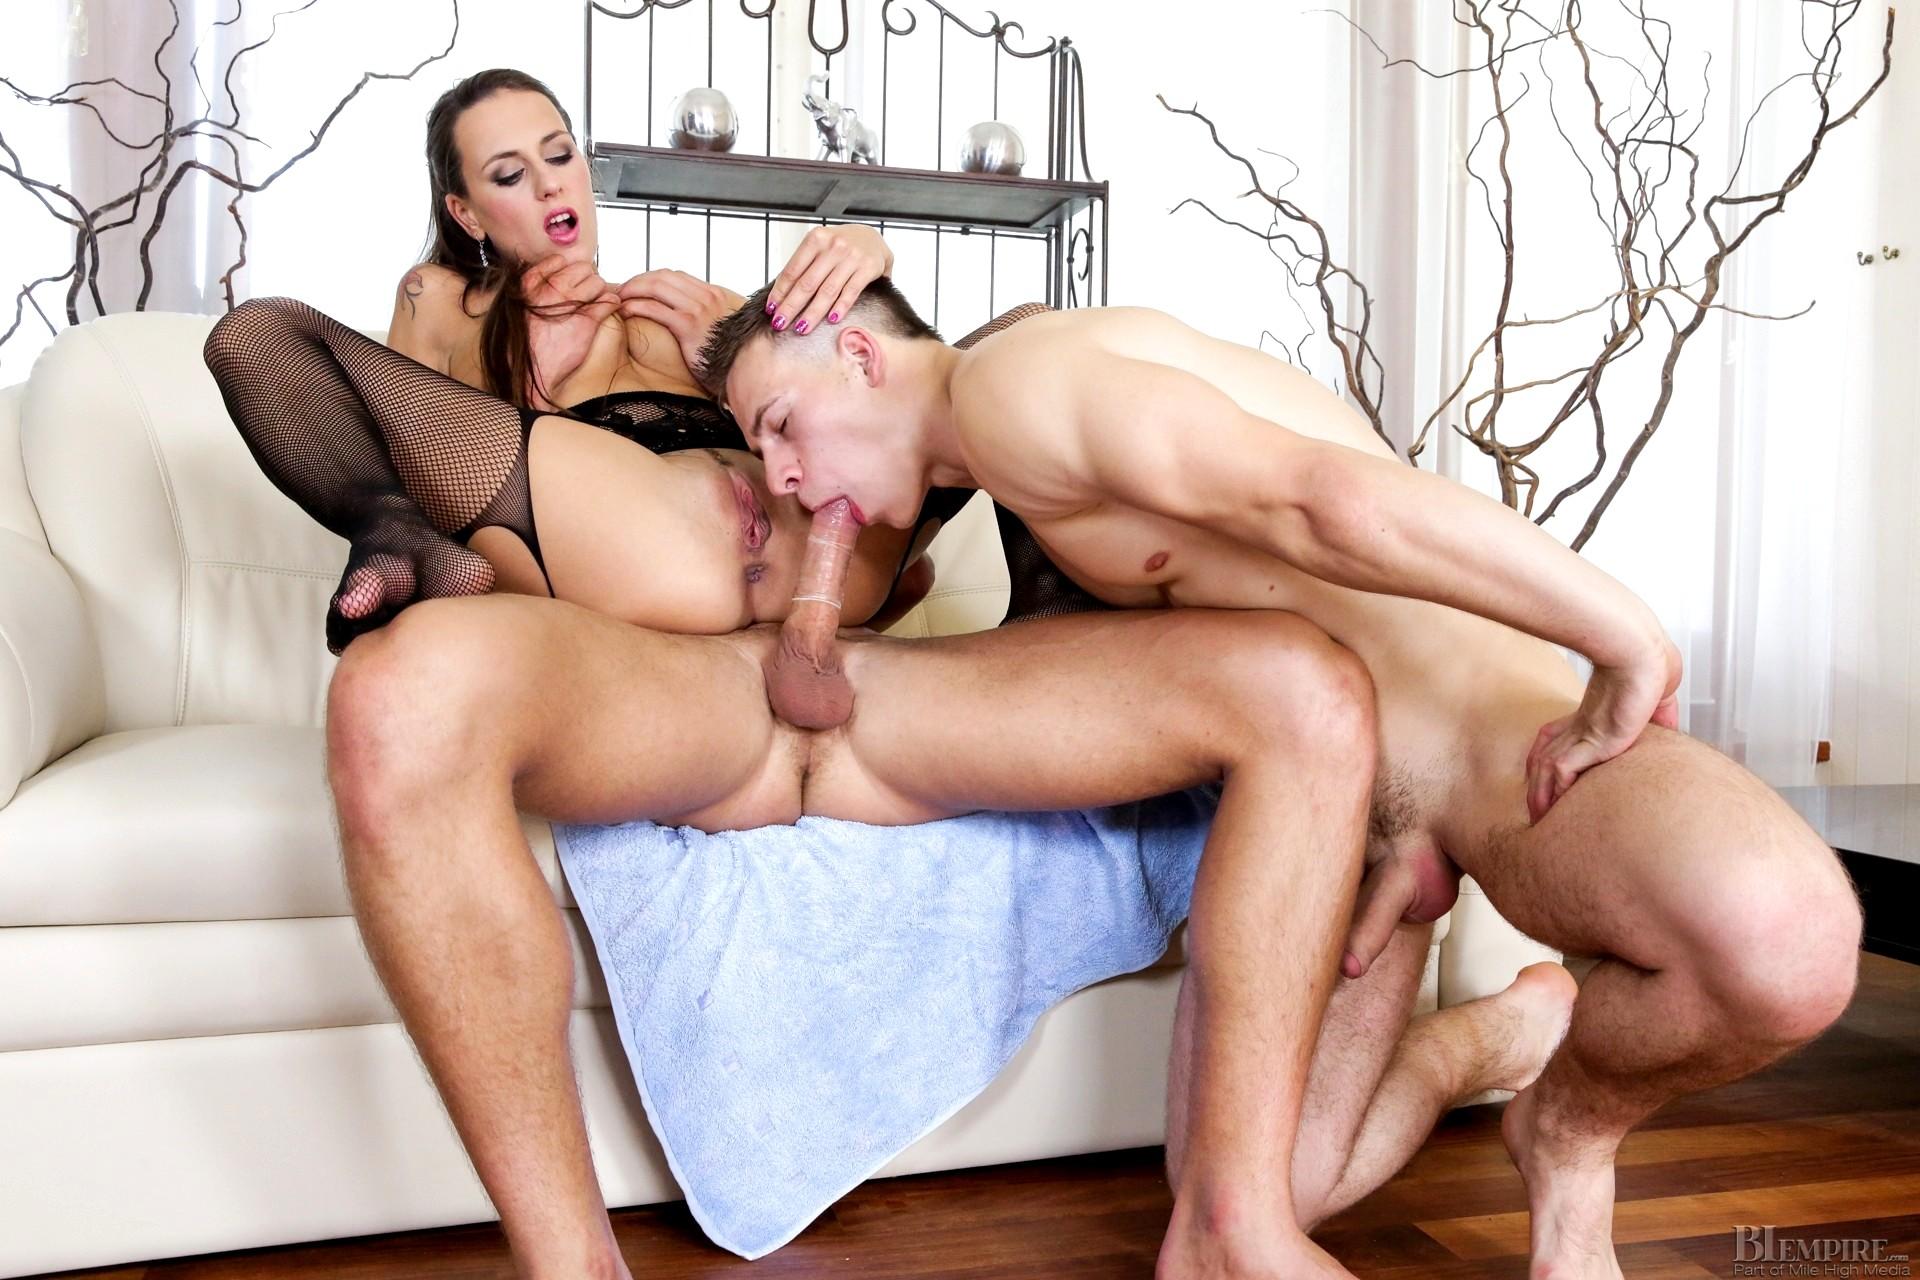 Hd mature mmf threesome